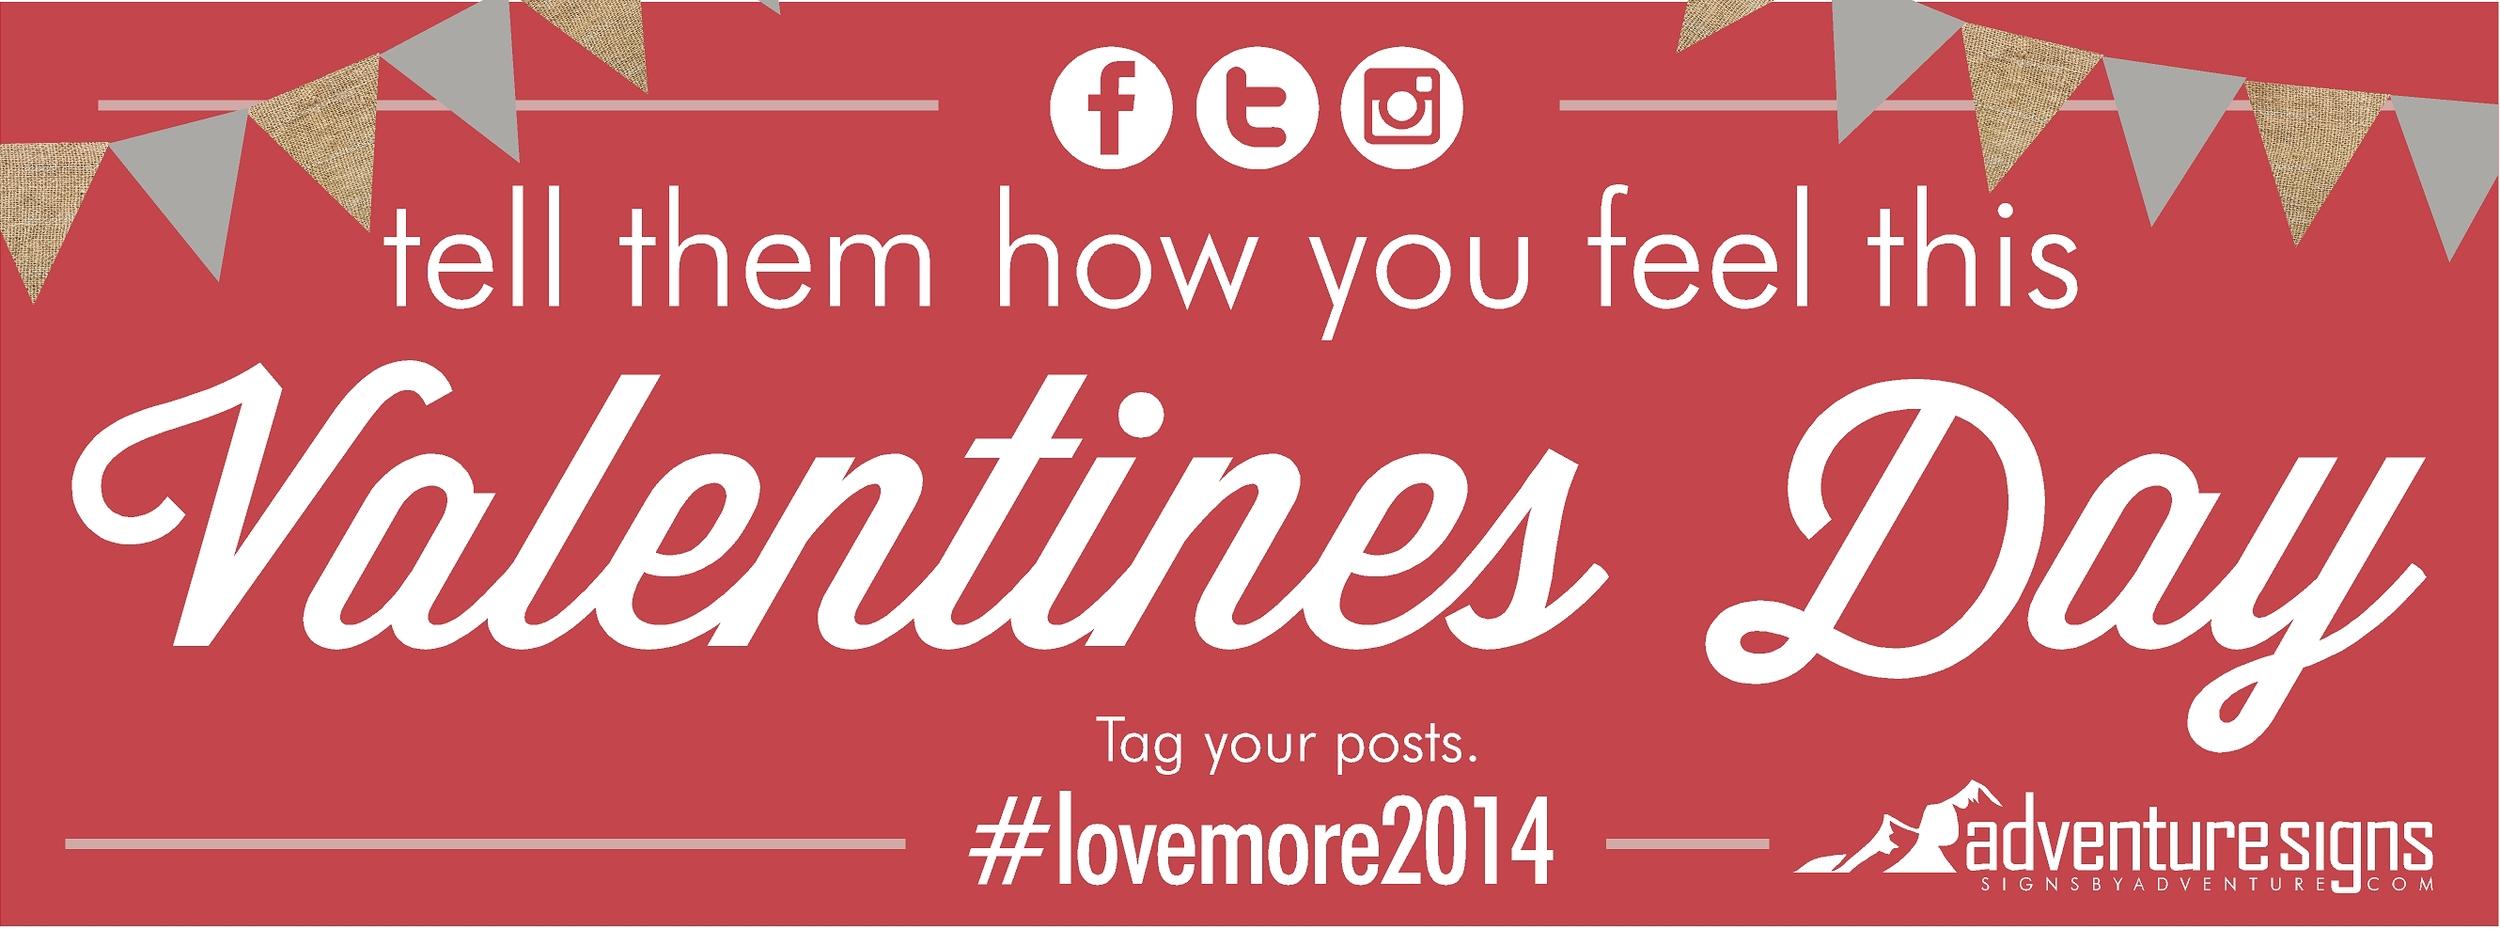 Valentines Day 2014.lovemore2014.jpg